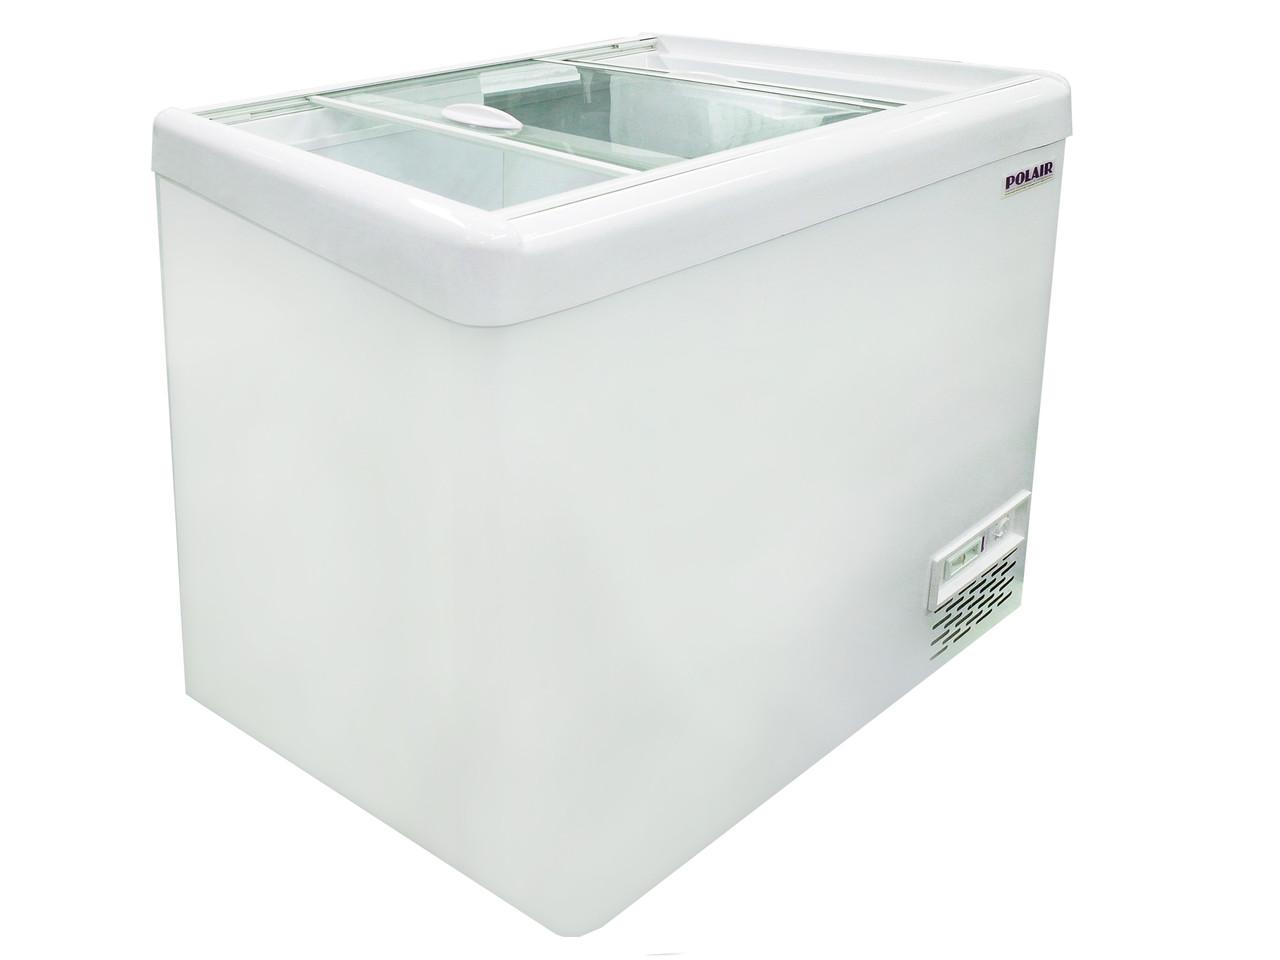 Морозильный ларь Polair DF 120 SF-S